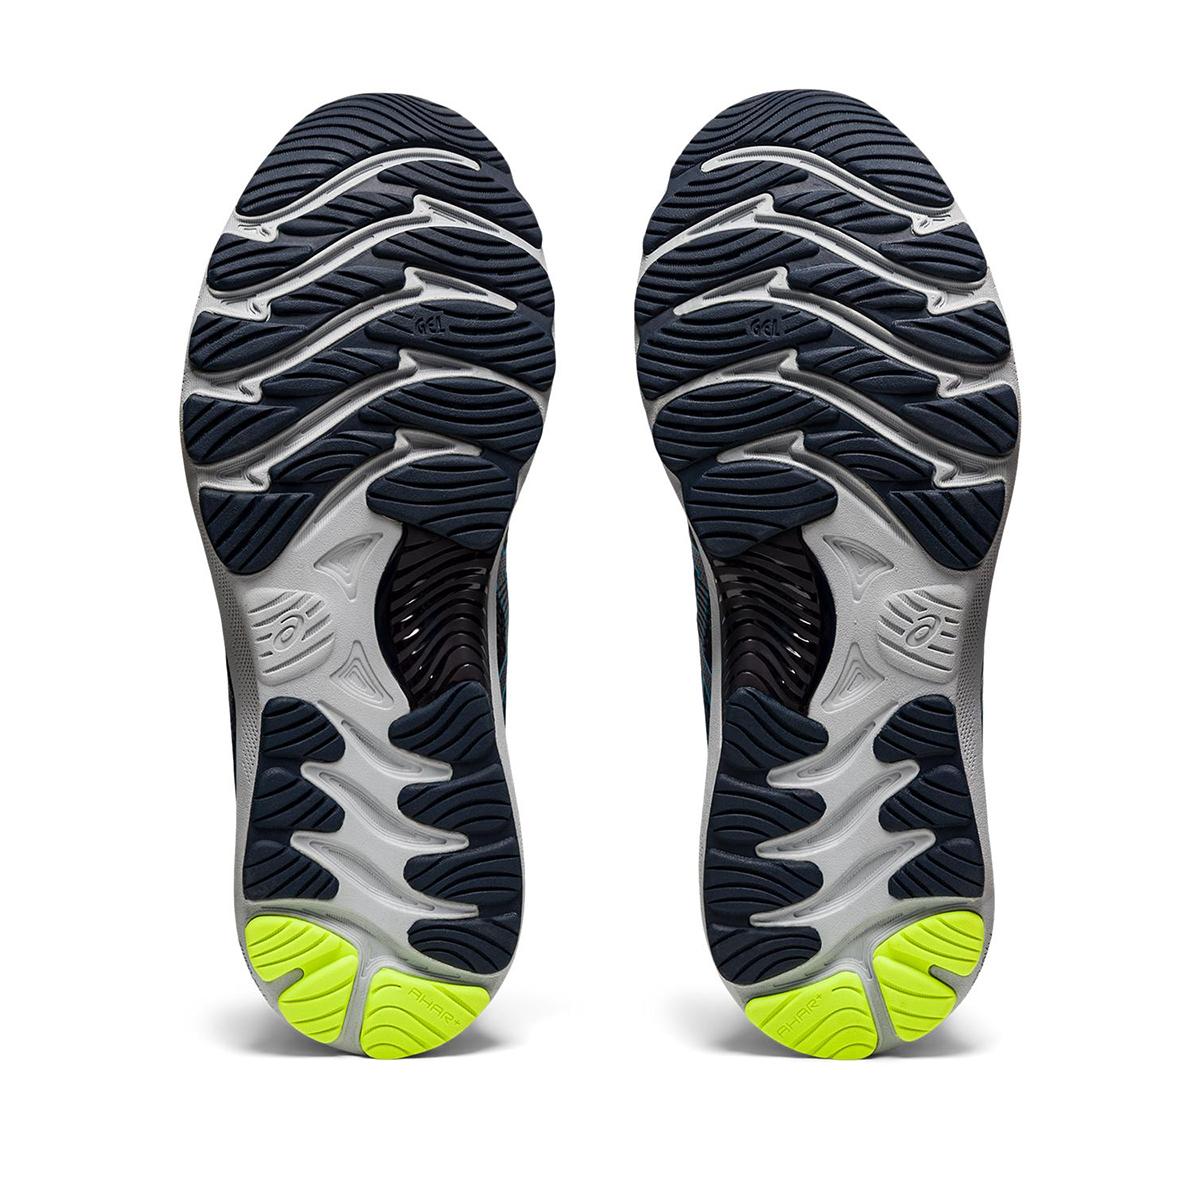 Men's Asics GEL-Nimbus 23 Running Shoe - Color: Carrier Grey/Digital Aqua - Size: 8.5 - Width: Regular, Carrier Grey/Digital Aqua, large, image 6